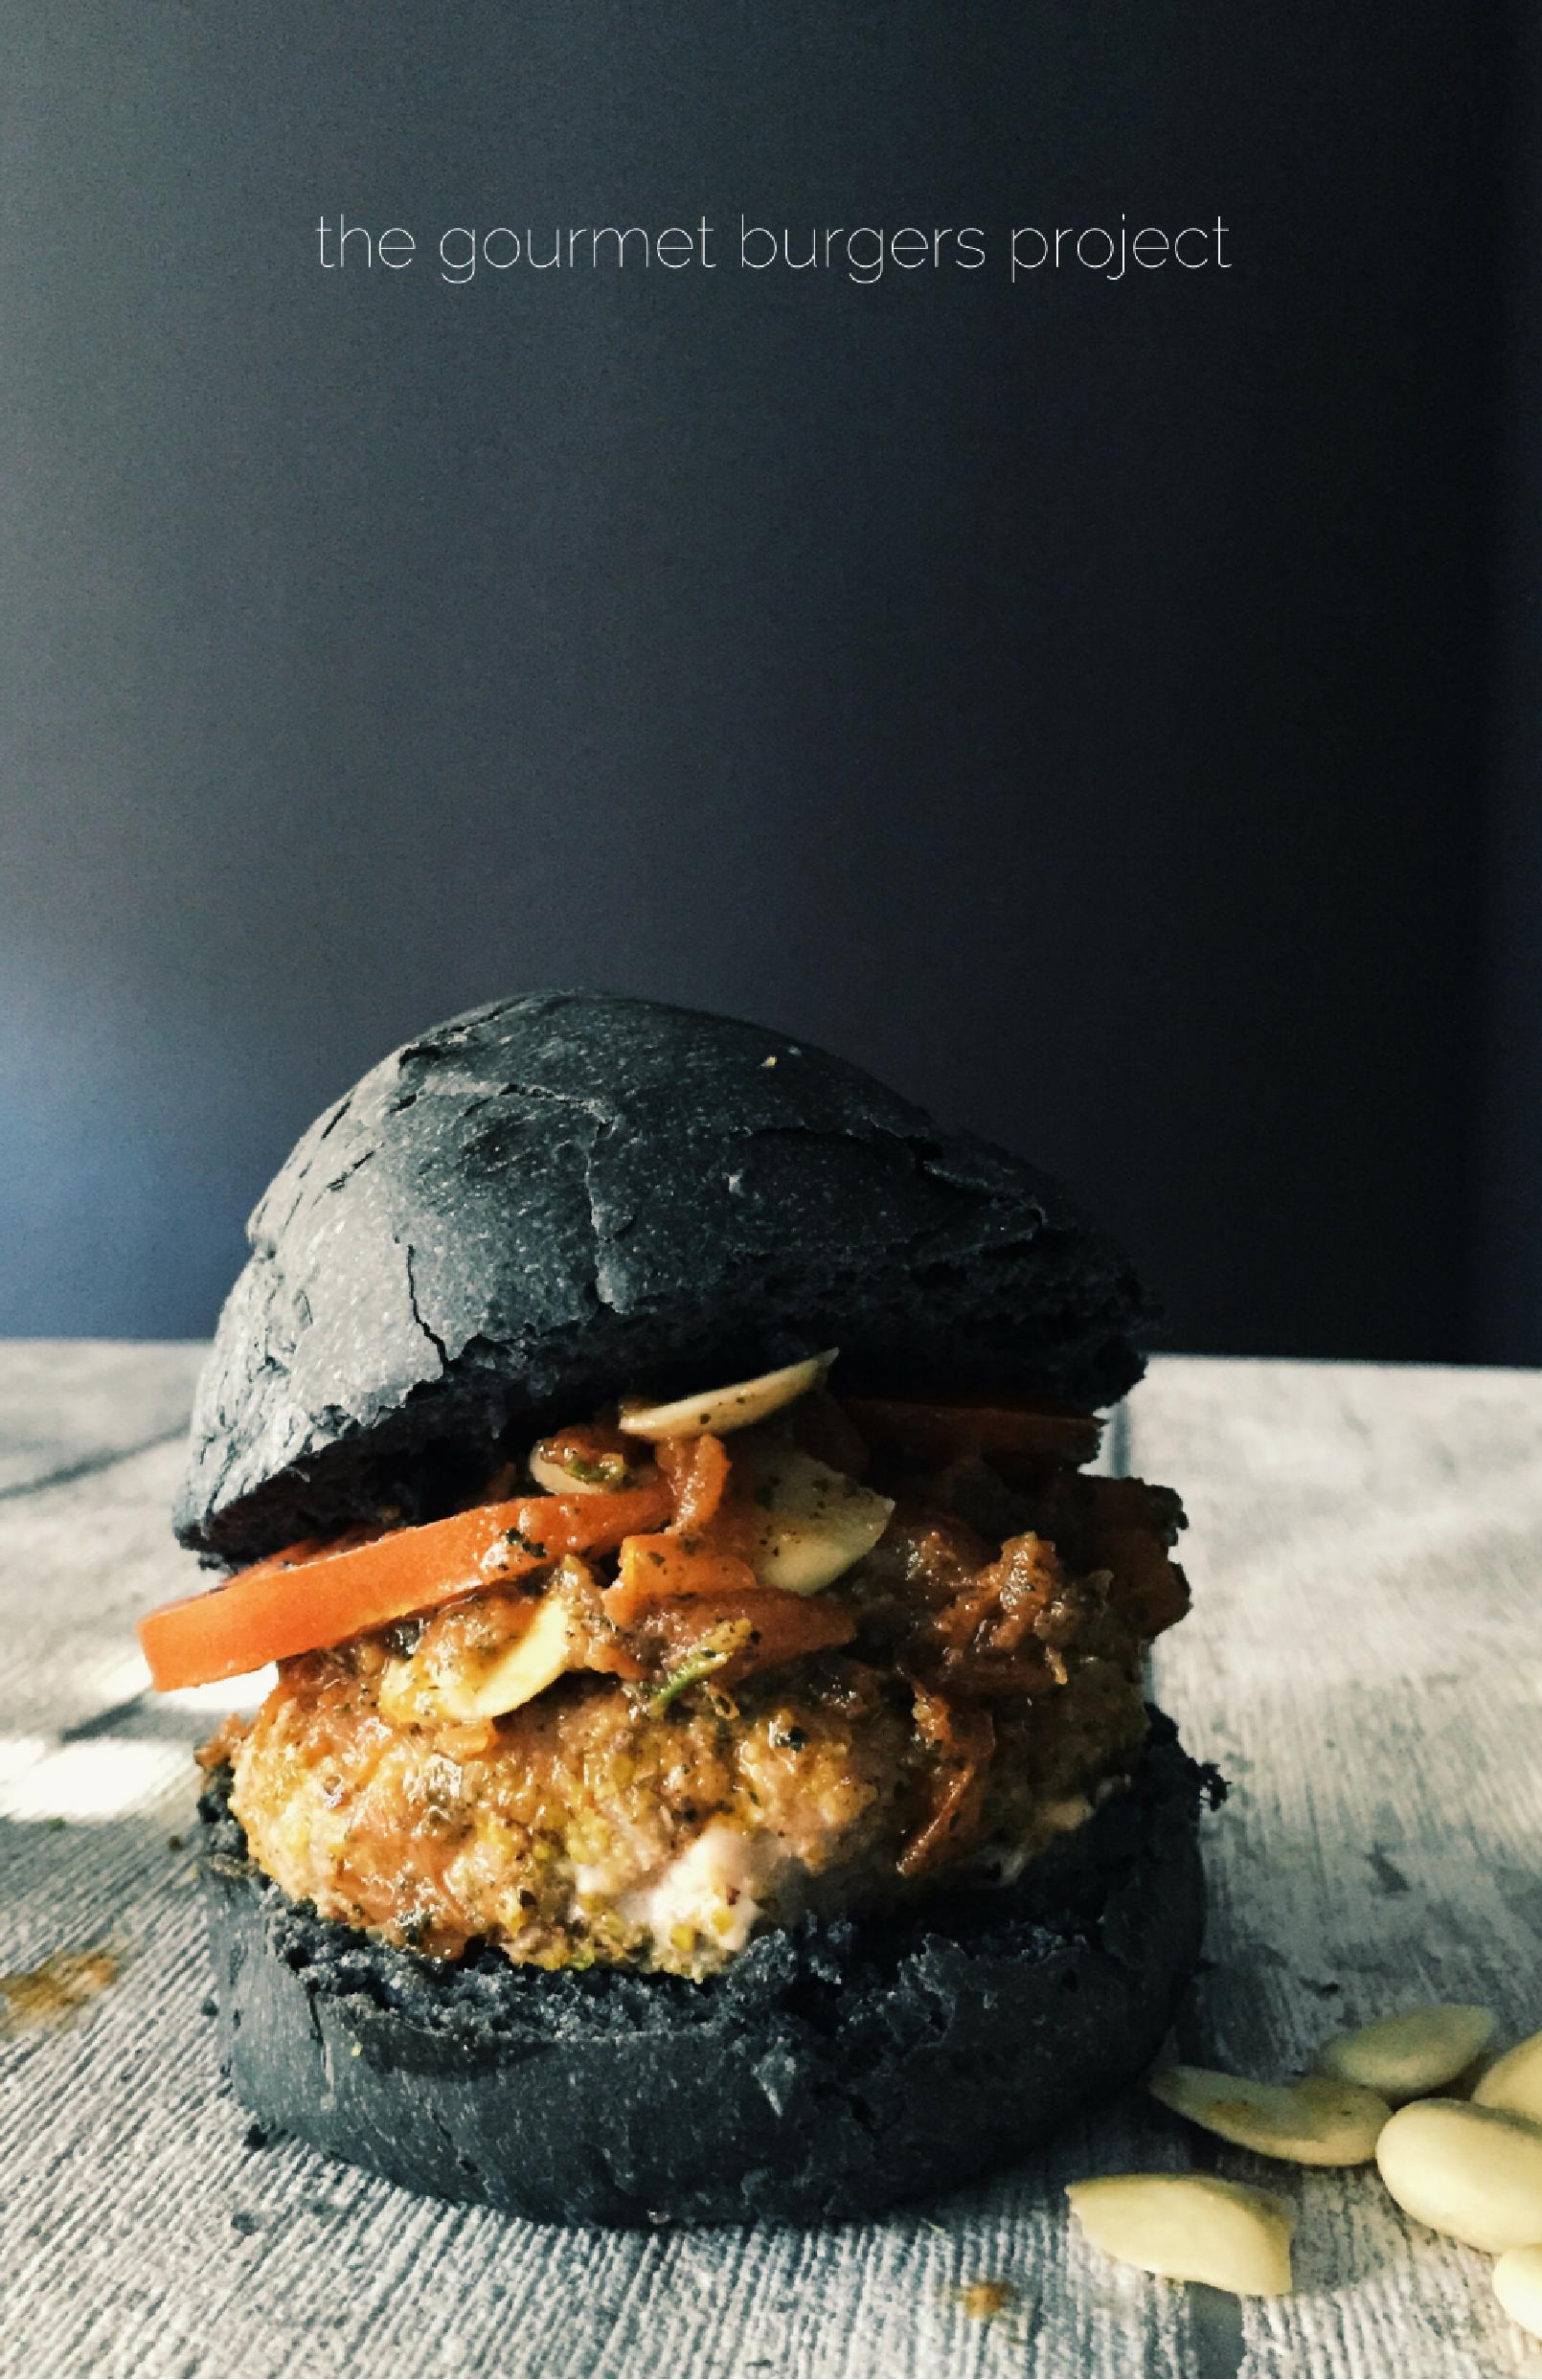 Italian burger recipes: the Sicilian tuna burger